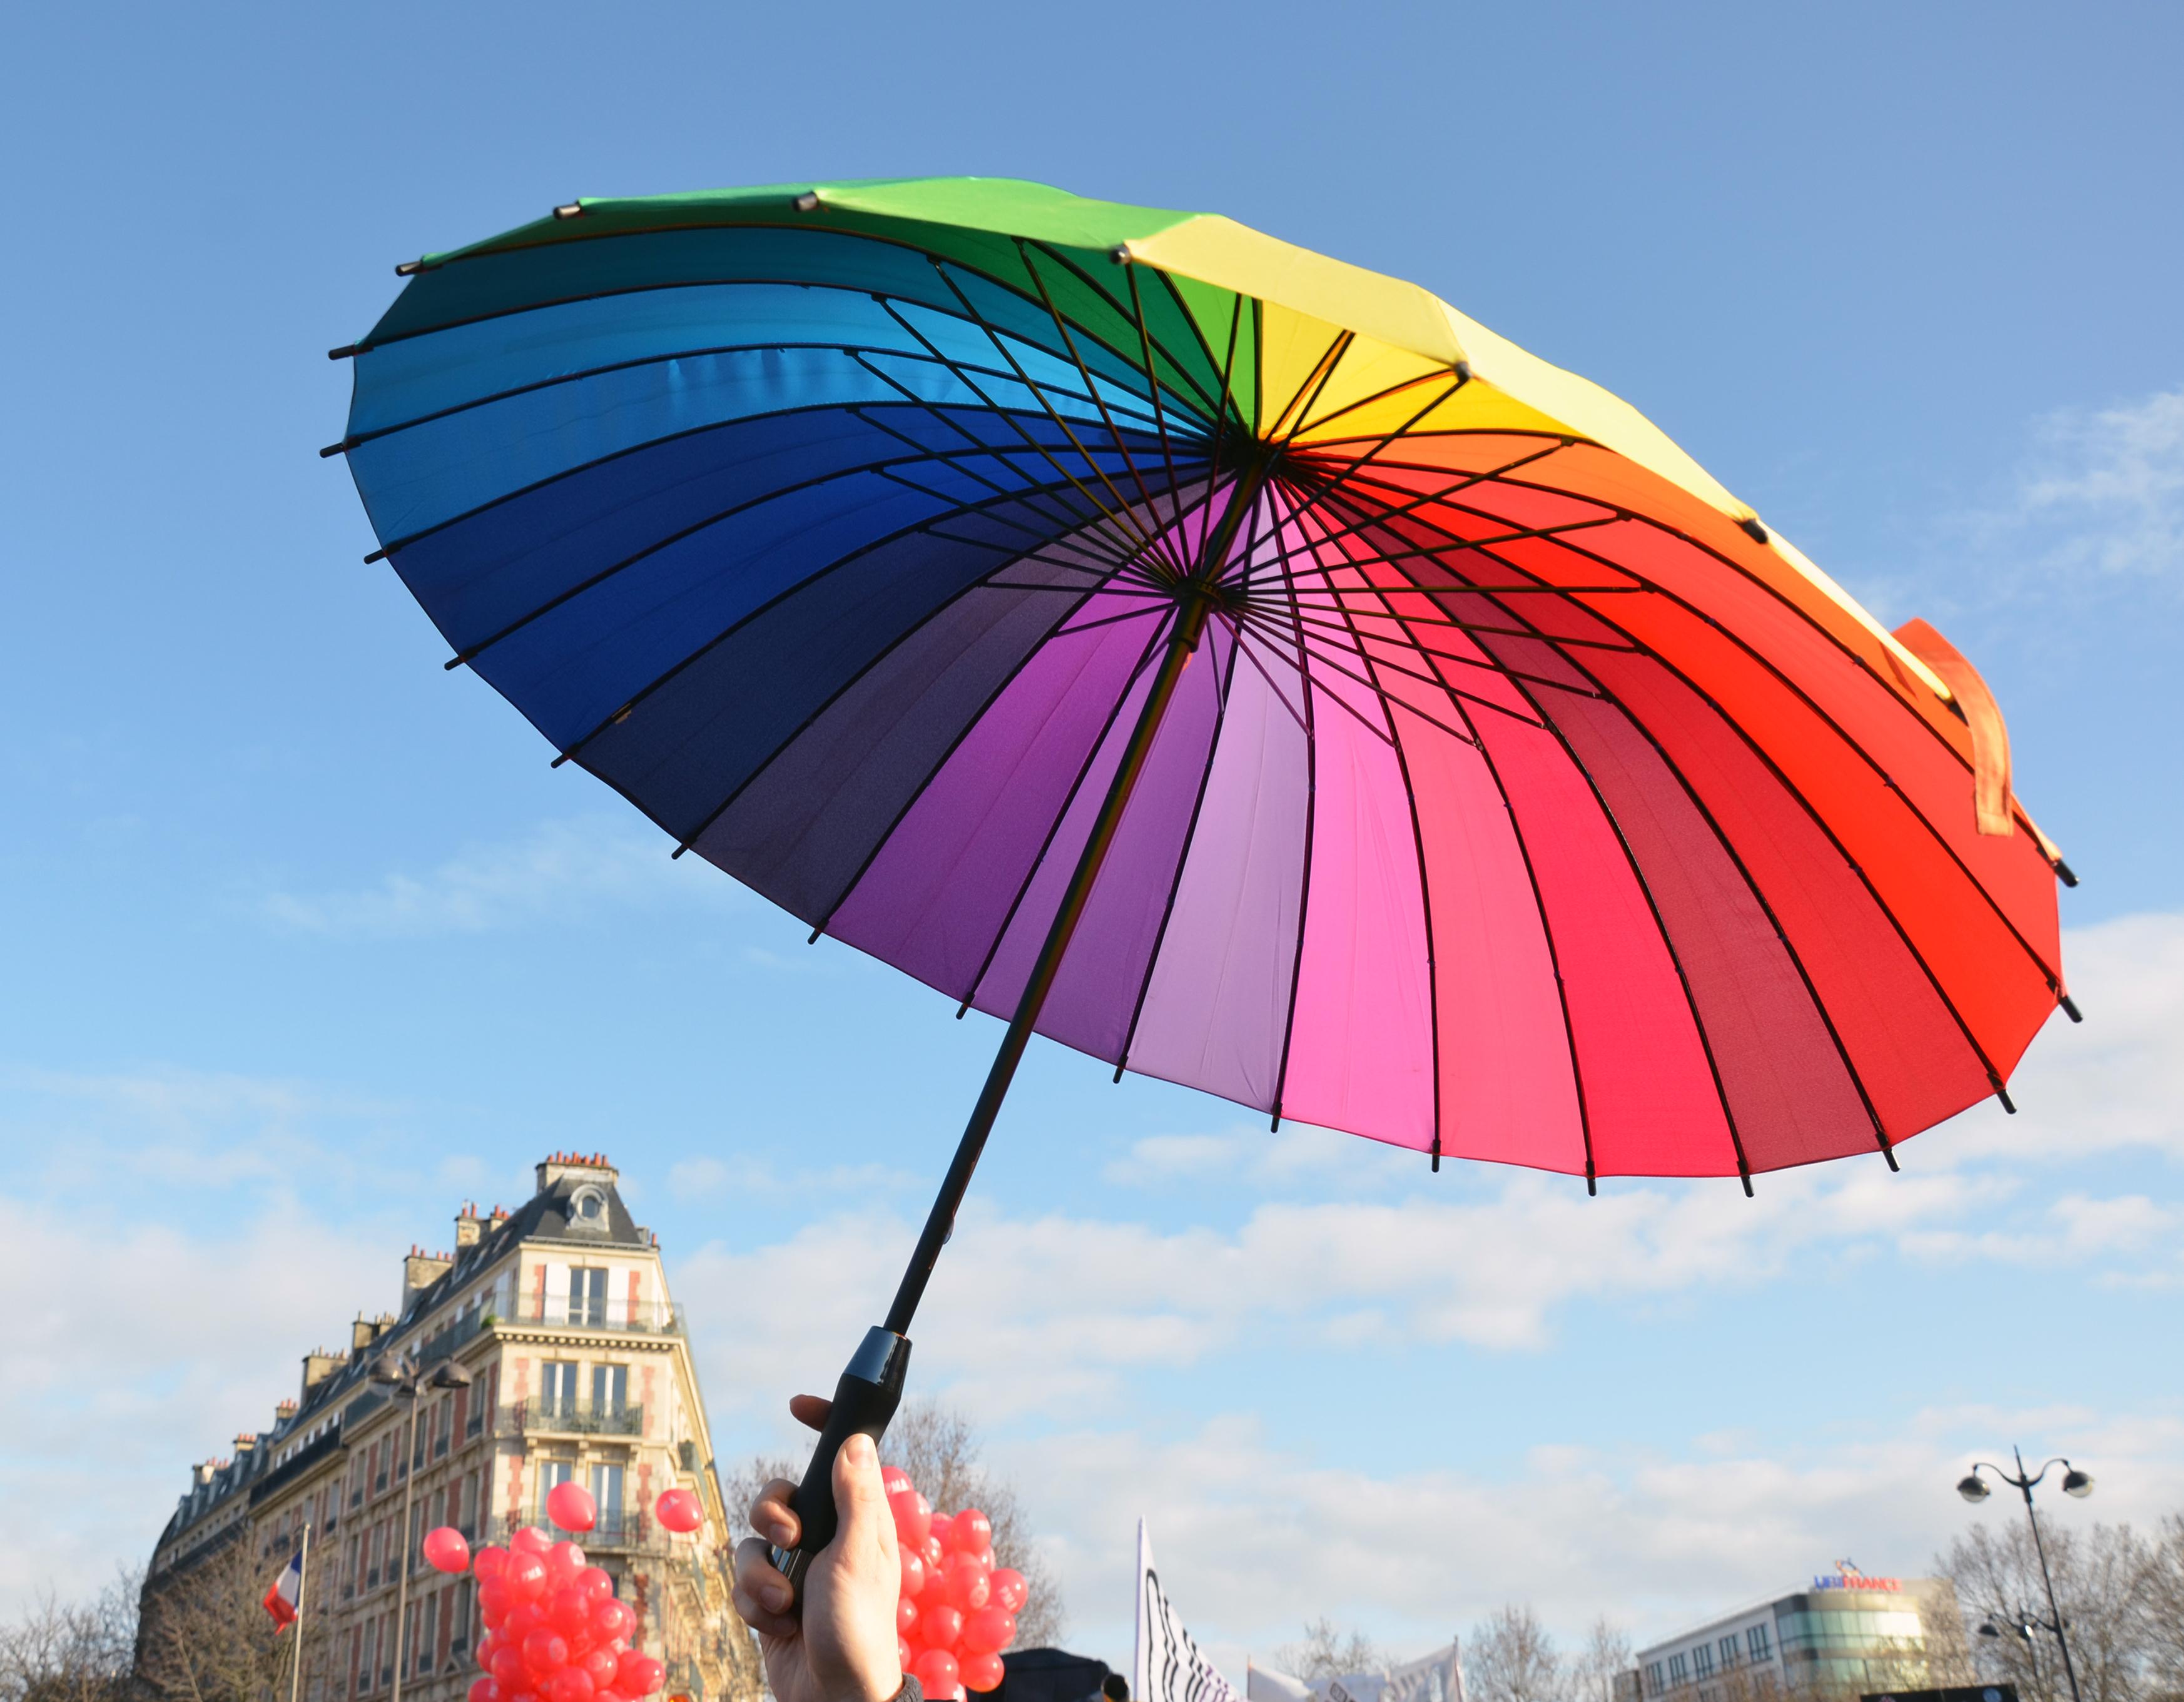 картинки яркого зонтика приятная цена нашем